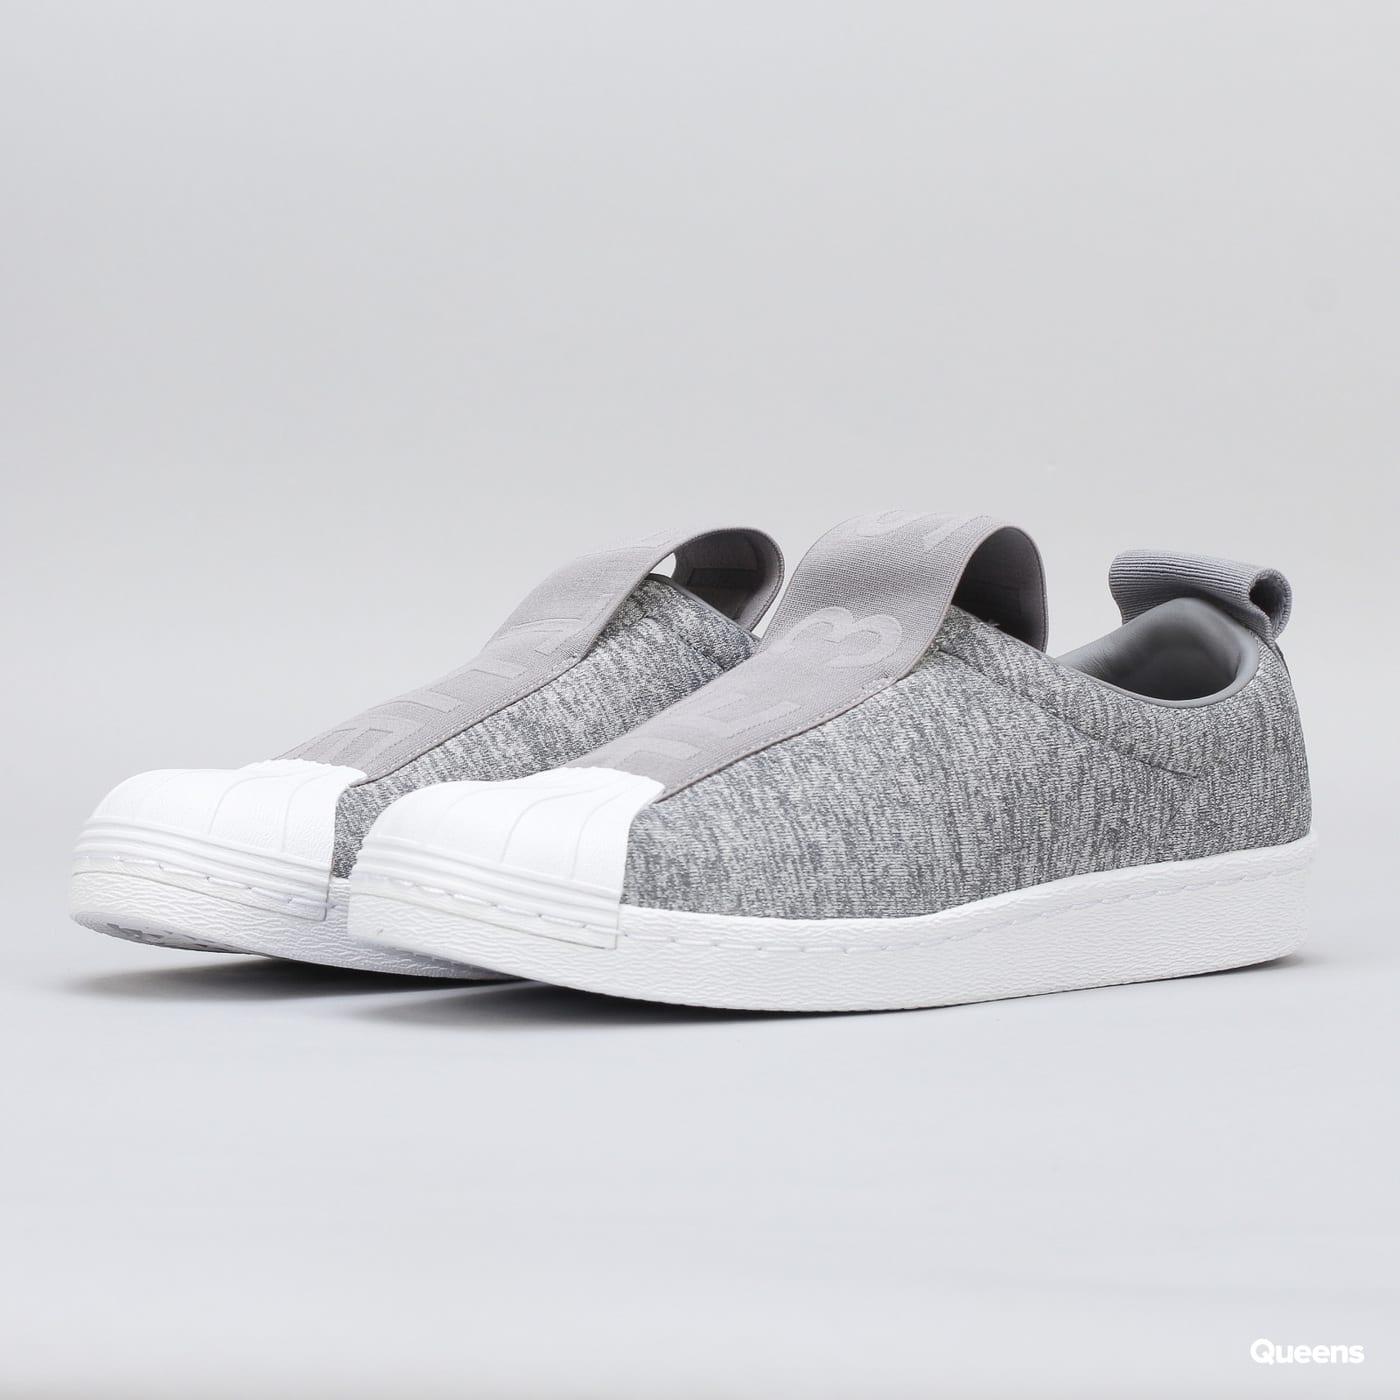 adidas Superstar BW3S Slipon W (CQ2520) – Queens 💚 4f00810070